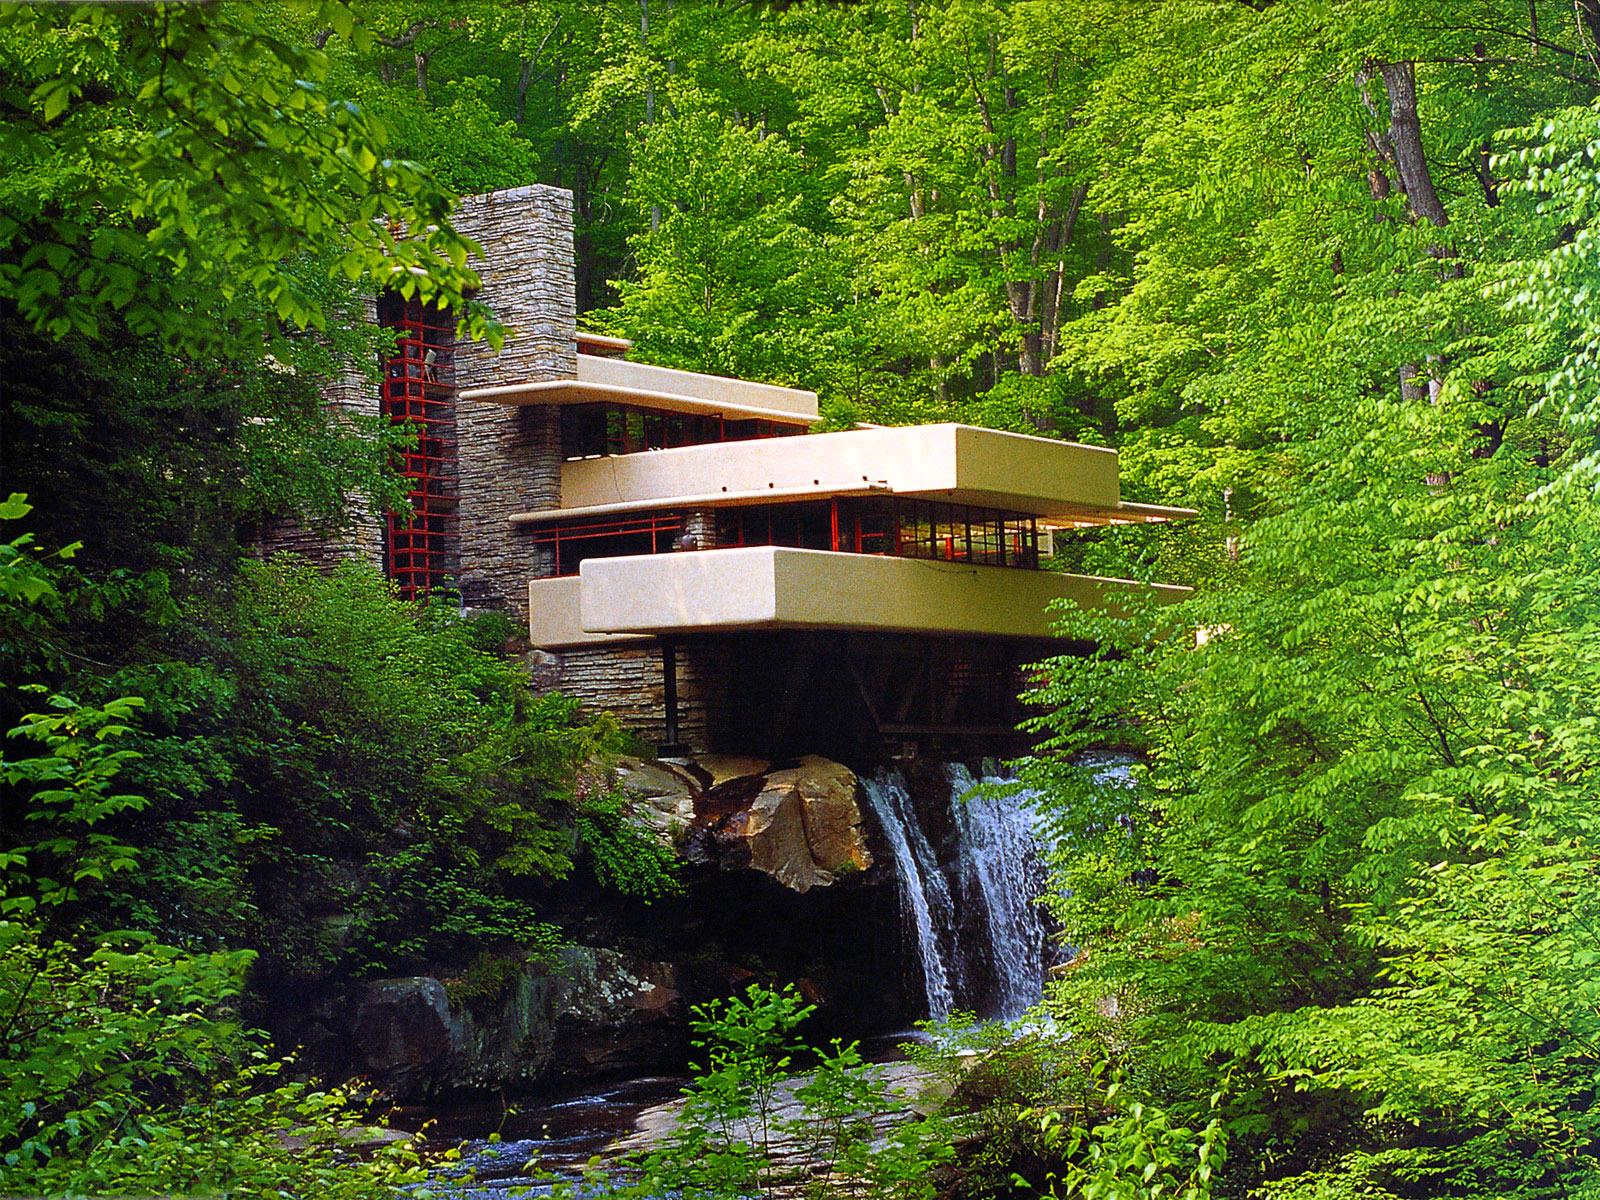 jlm-pennsylvania-fallingwater-frank-lloyd-wright-1932-1600